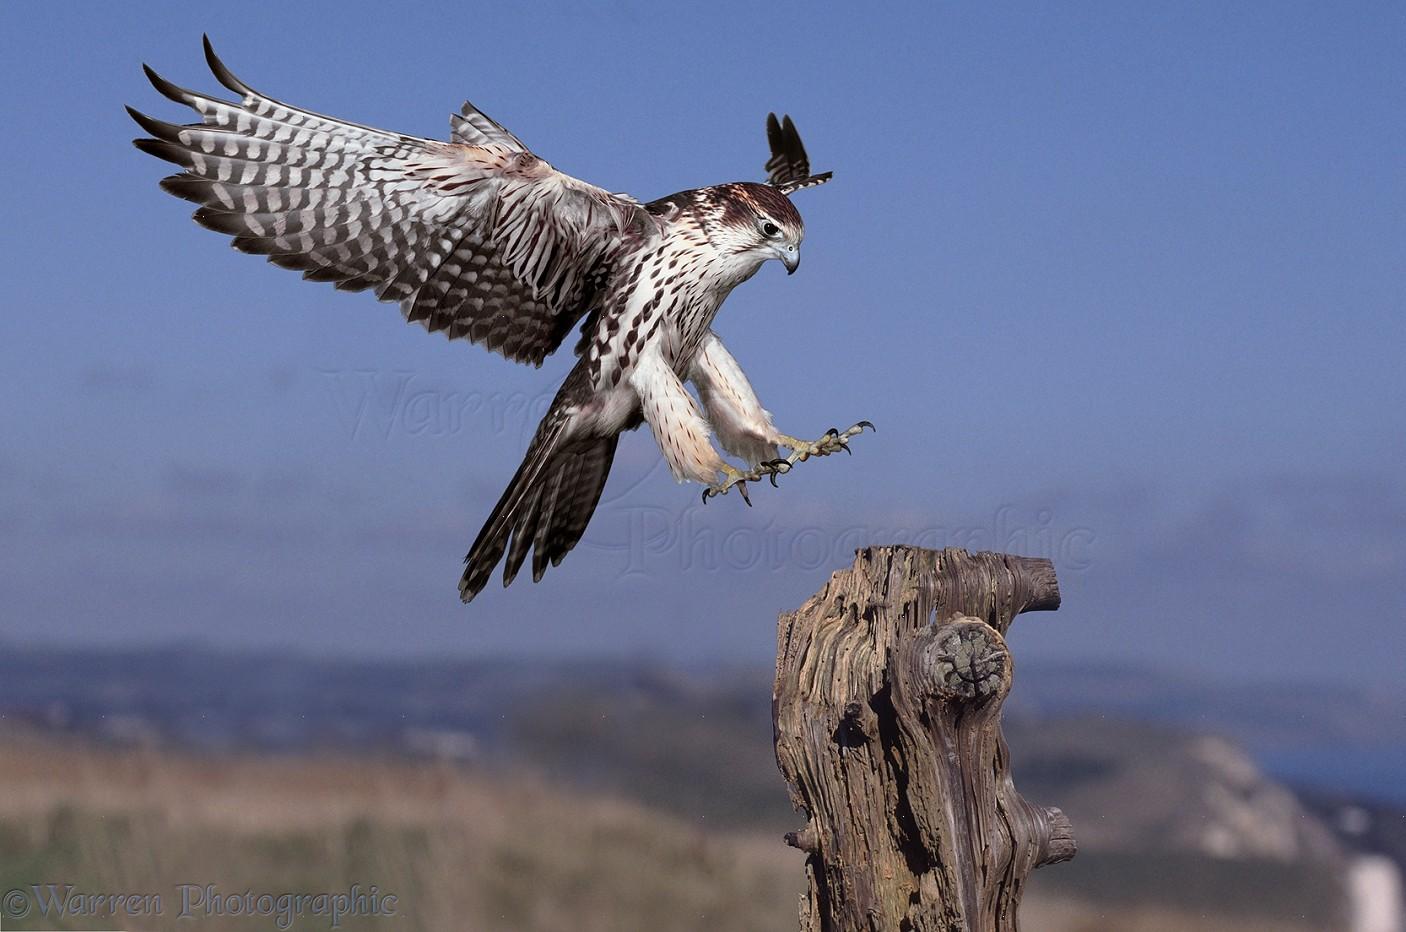 Dorisdukephotos ddpph06005 besides View also 29574595621 also 399 as well 1963brad. on the falcon